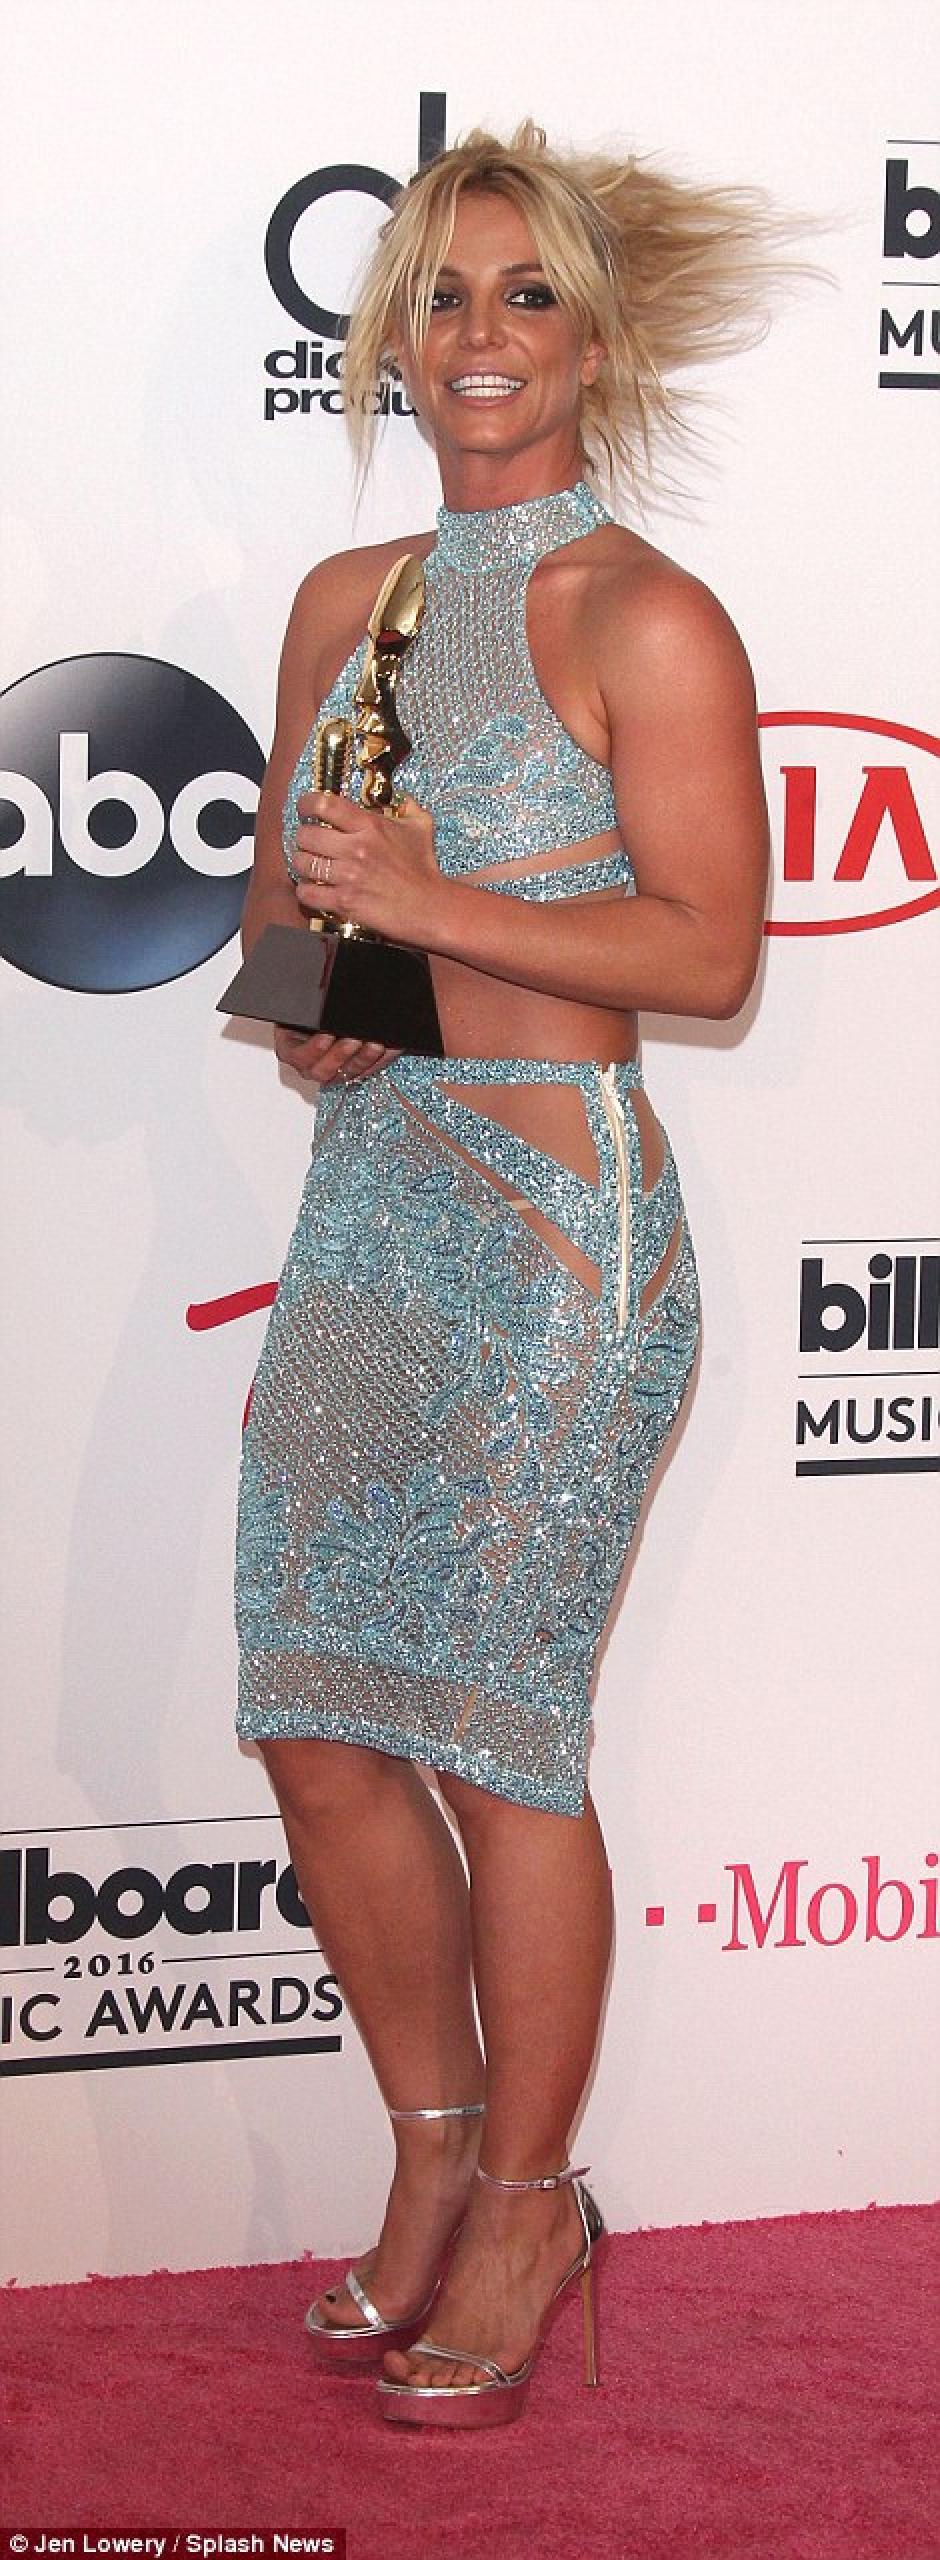 "La artista recibió el ""Millennium Award"". (Jen Lowery/Splash News)"